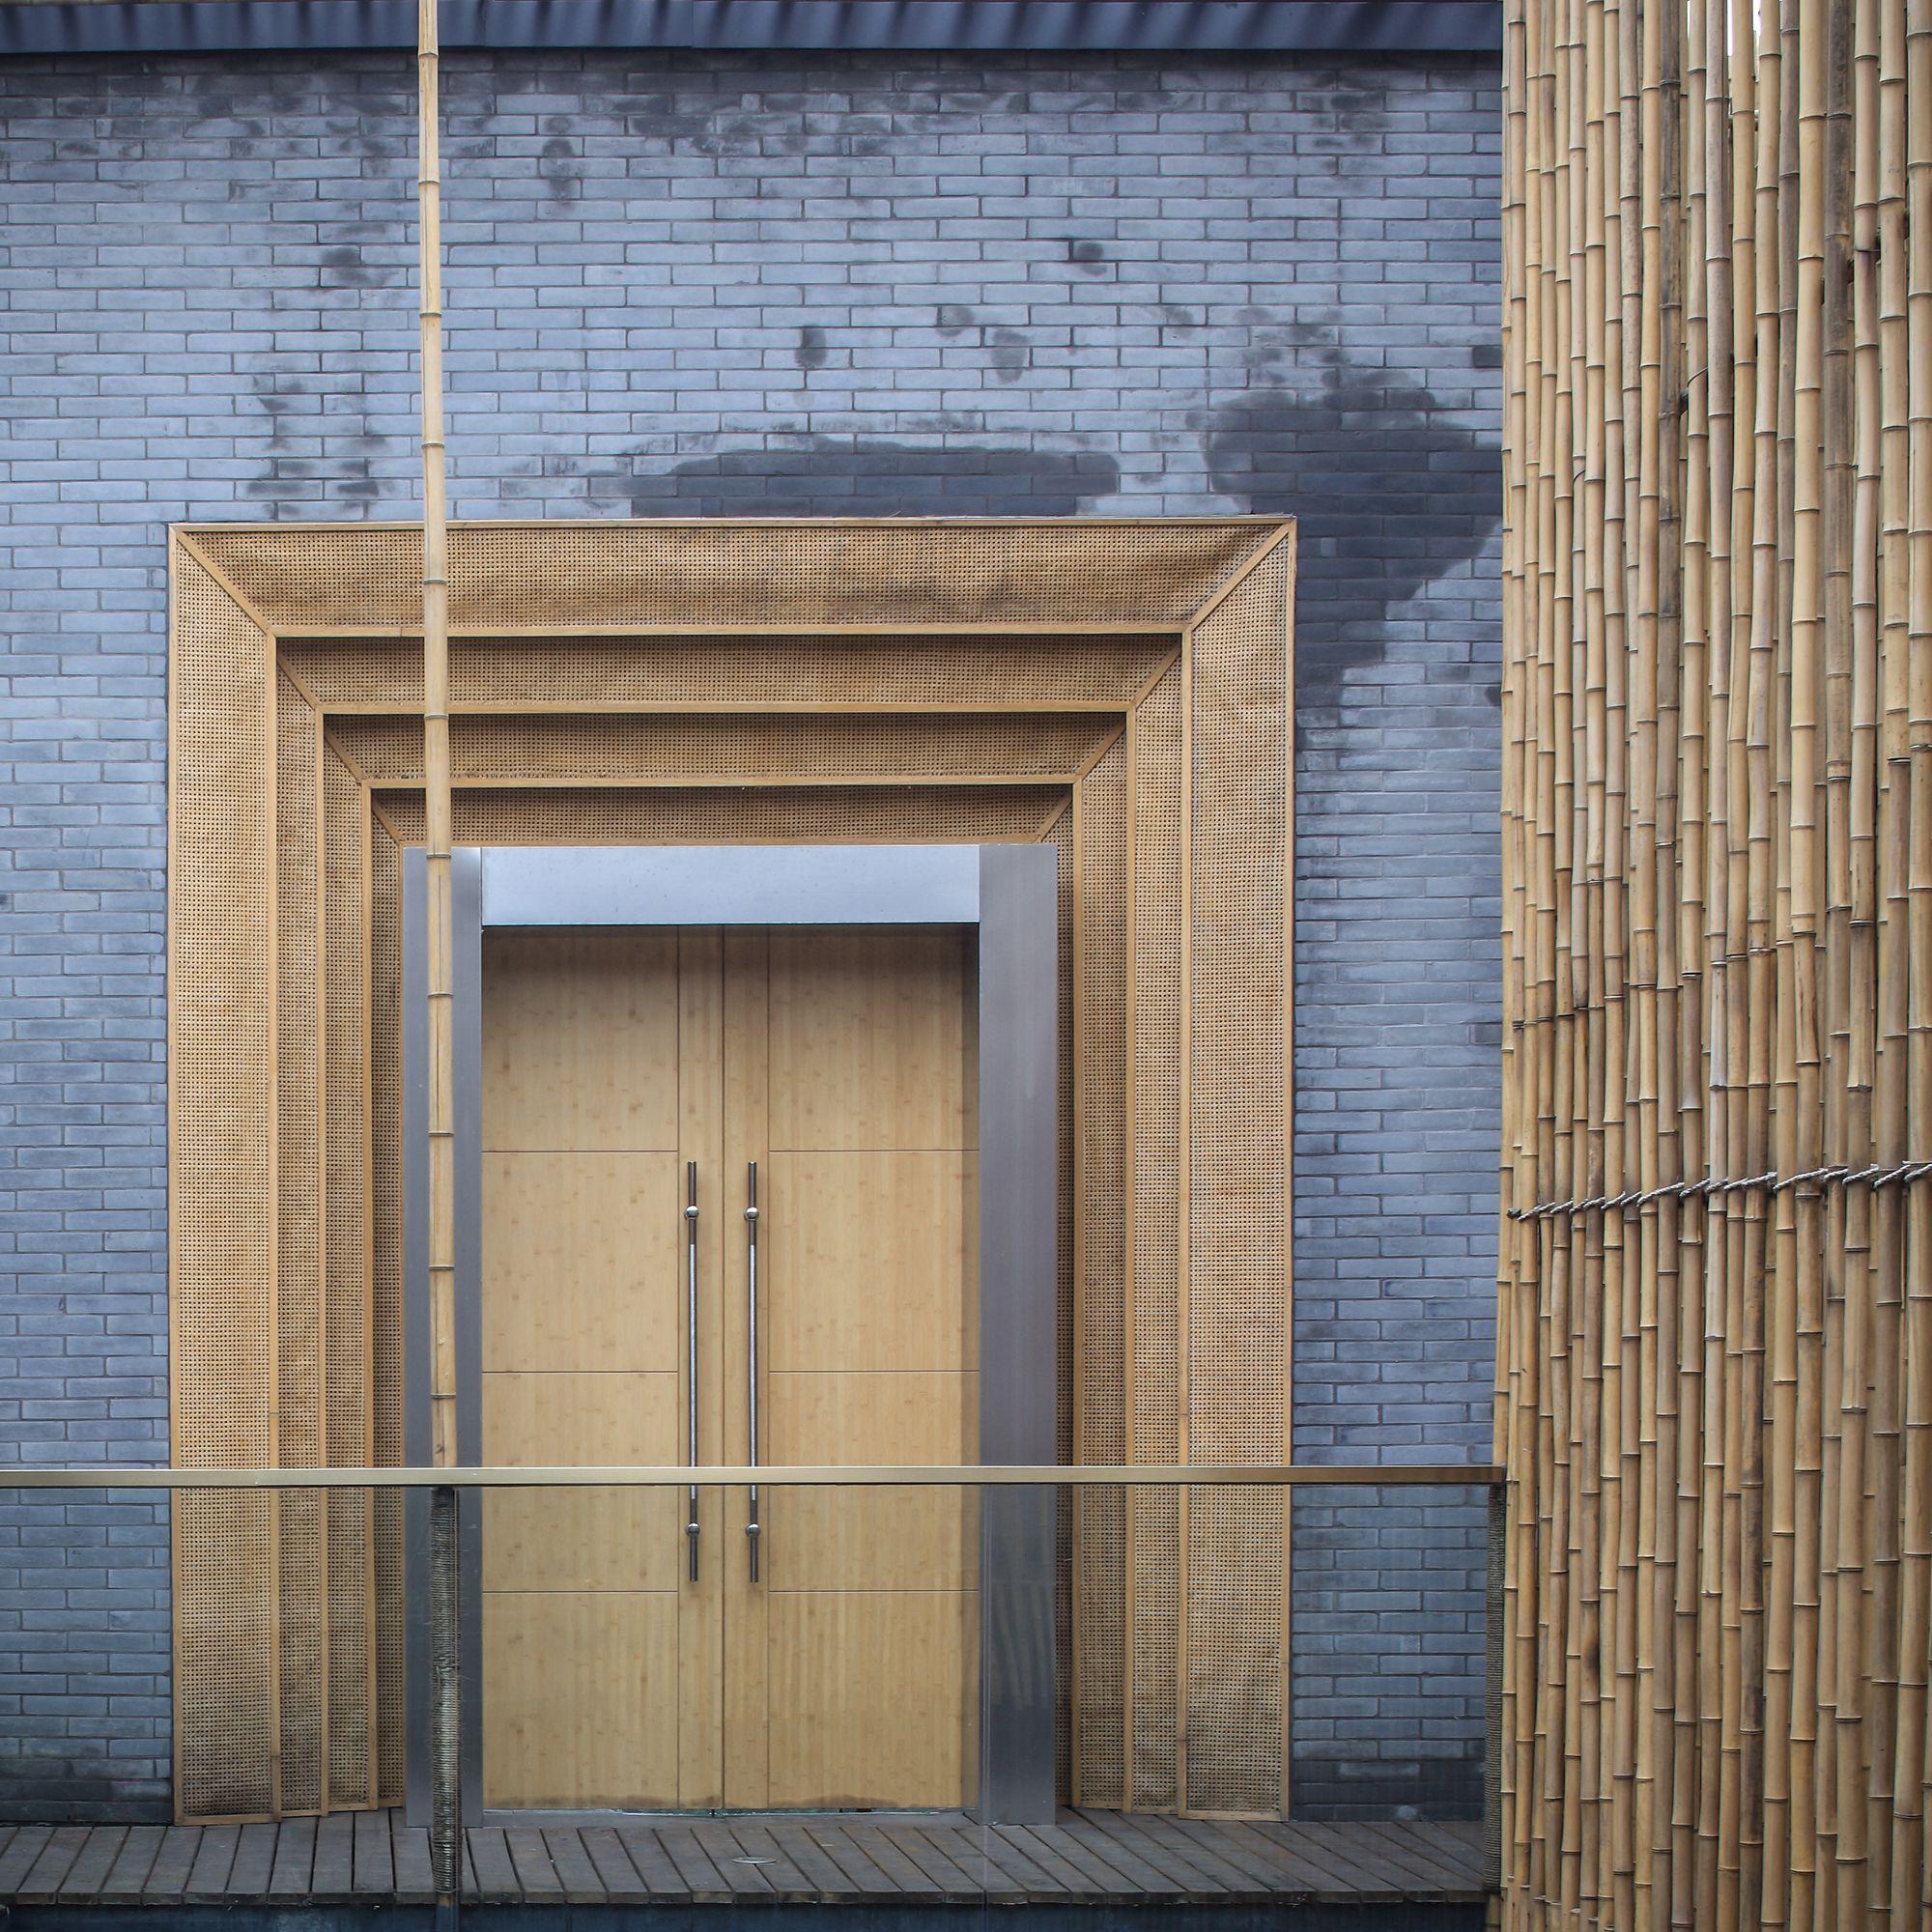 teahouse_12 detail of tea room's gateway